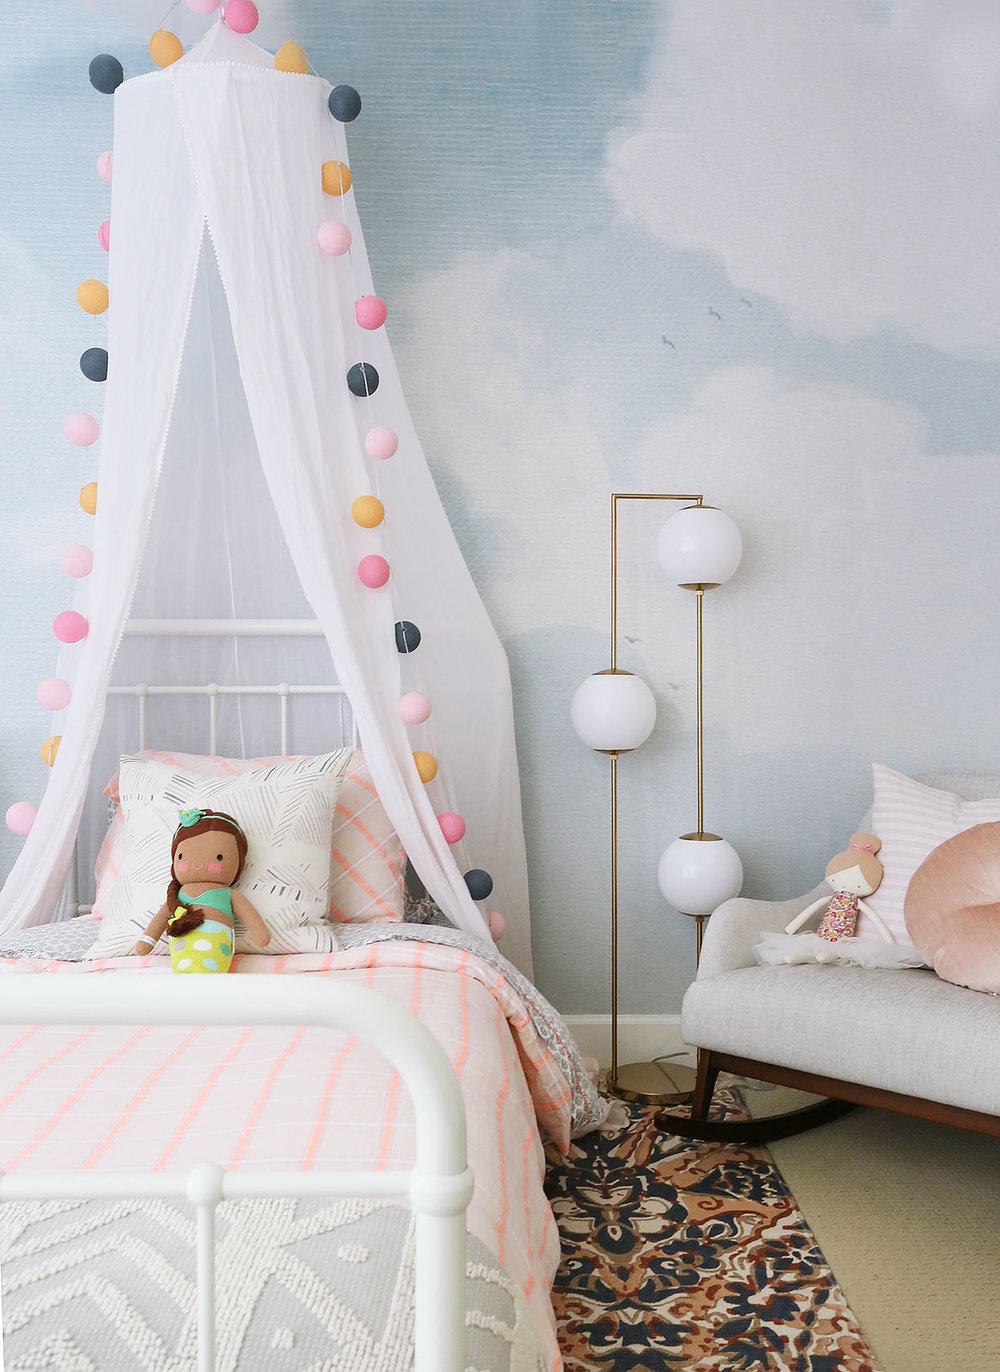 zora-bedroom-2-blog.jpg